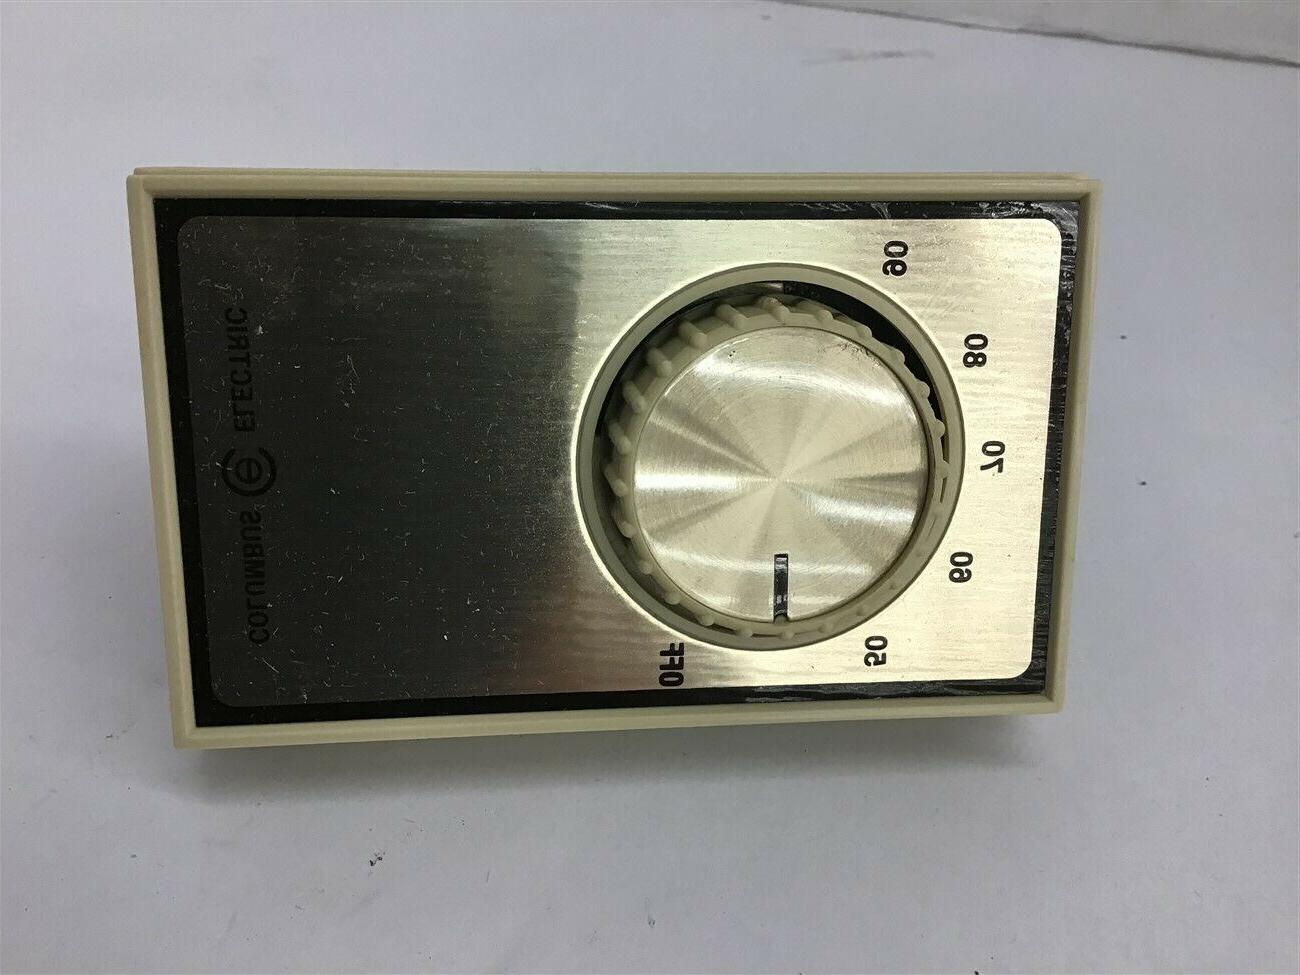 Columbus AET5DW1 Voltage Heating 22 50-90 Degree F